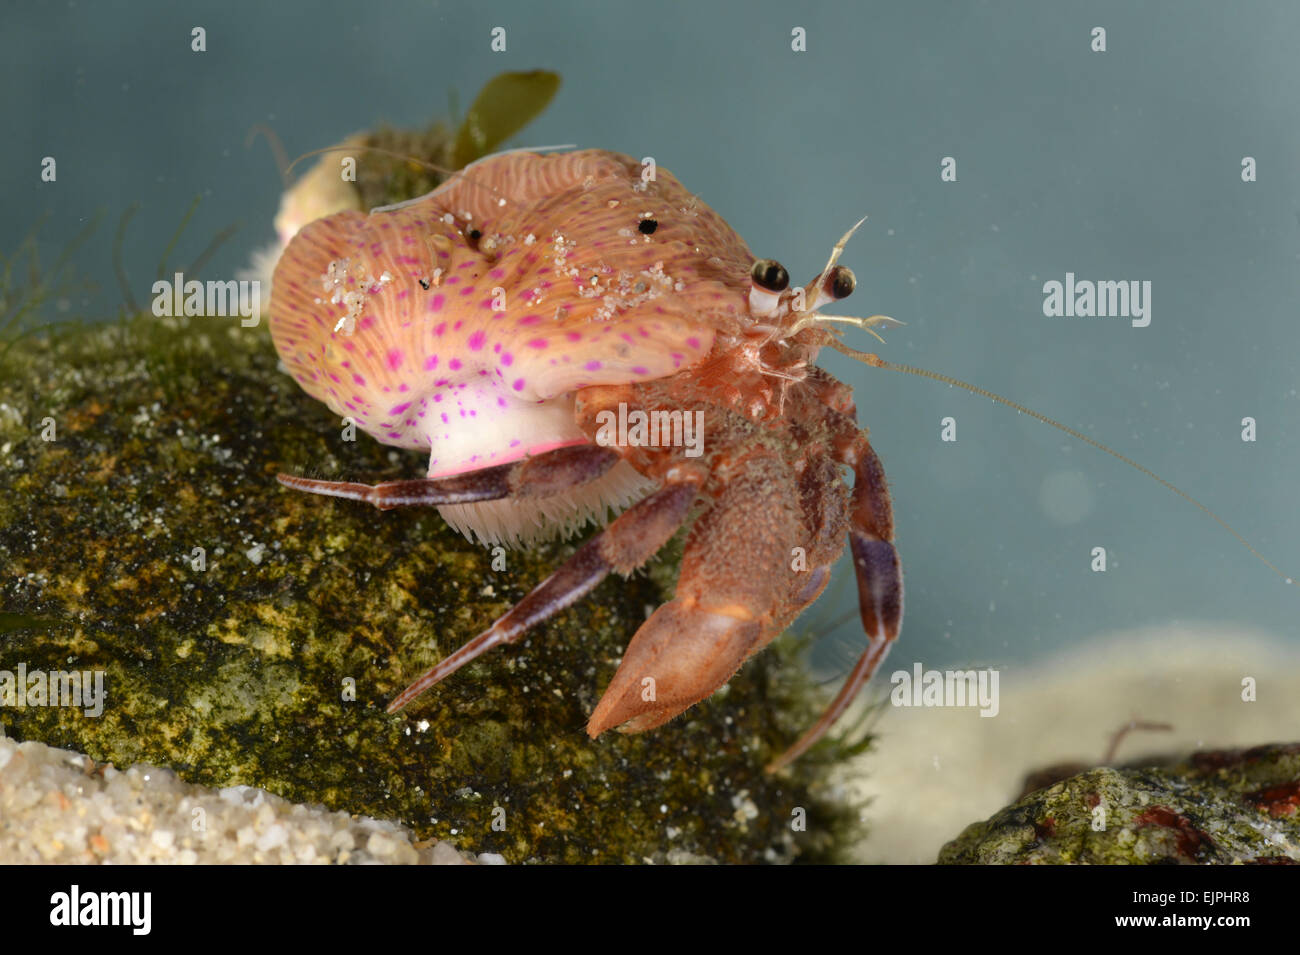 Hermit crab - Eupagurus prideaux with commensal Cloak Anemone - Adamsia carcinopados - Stock Image